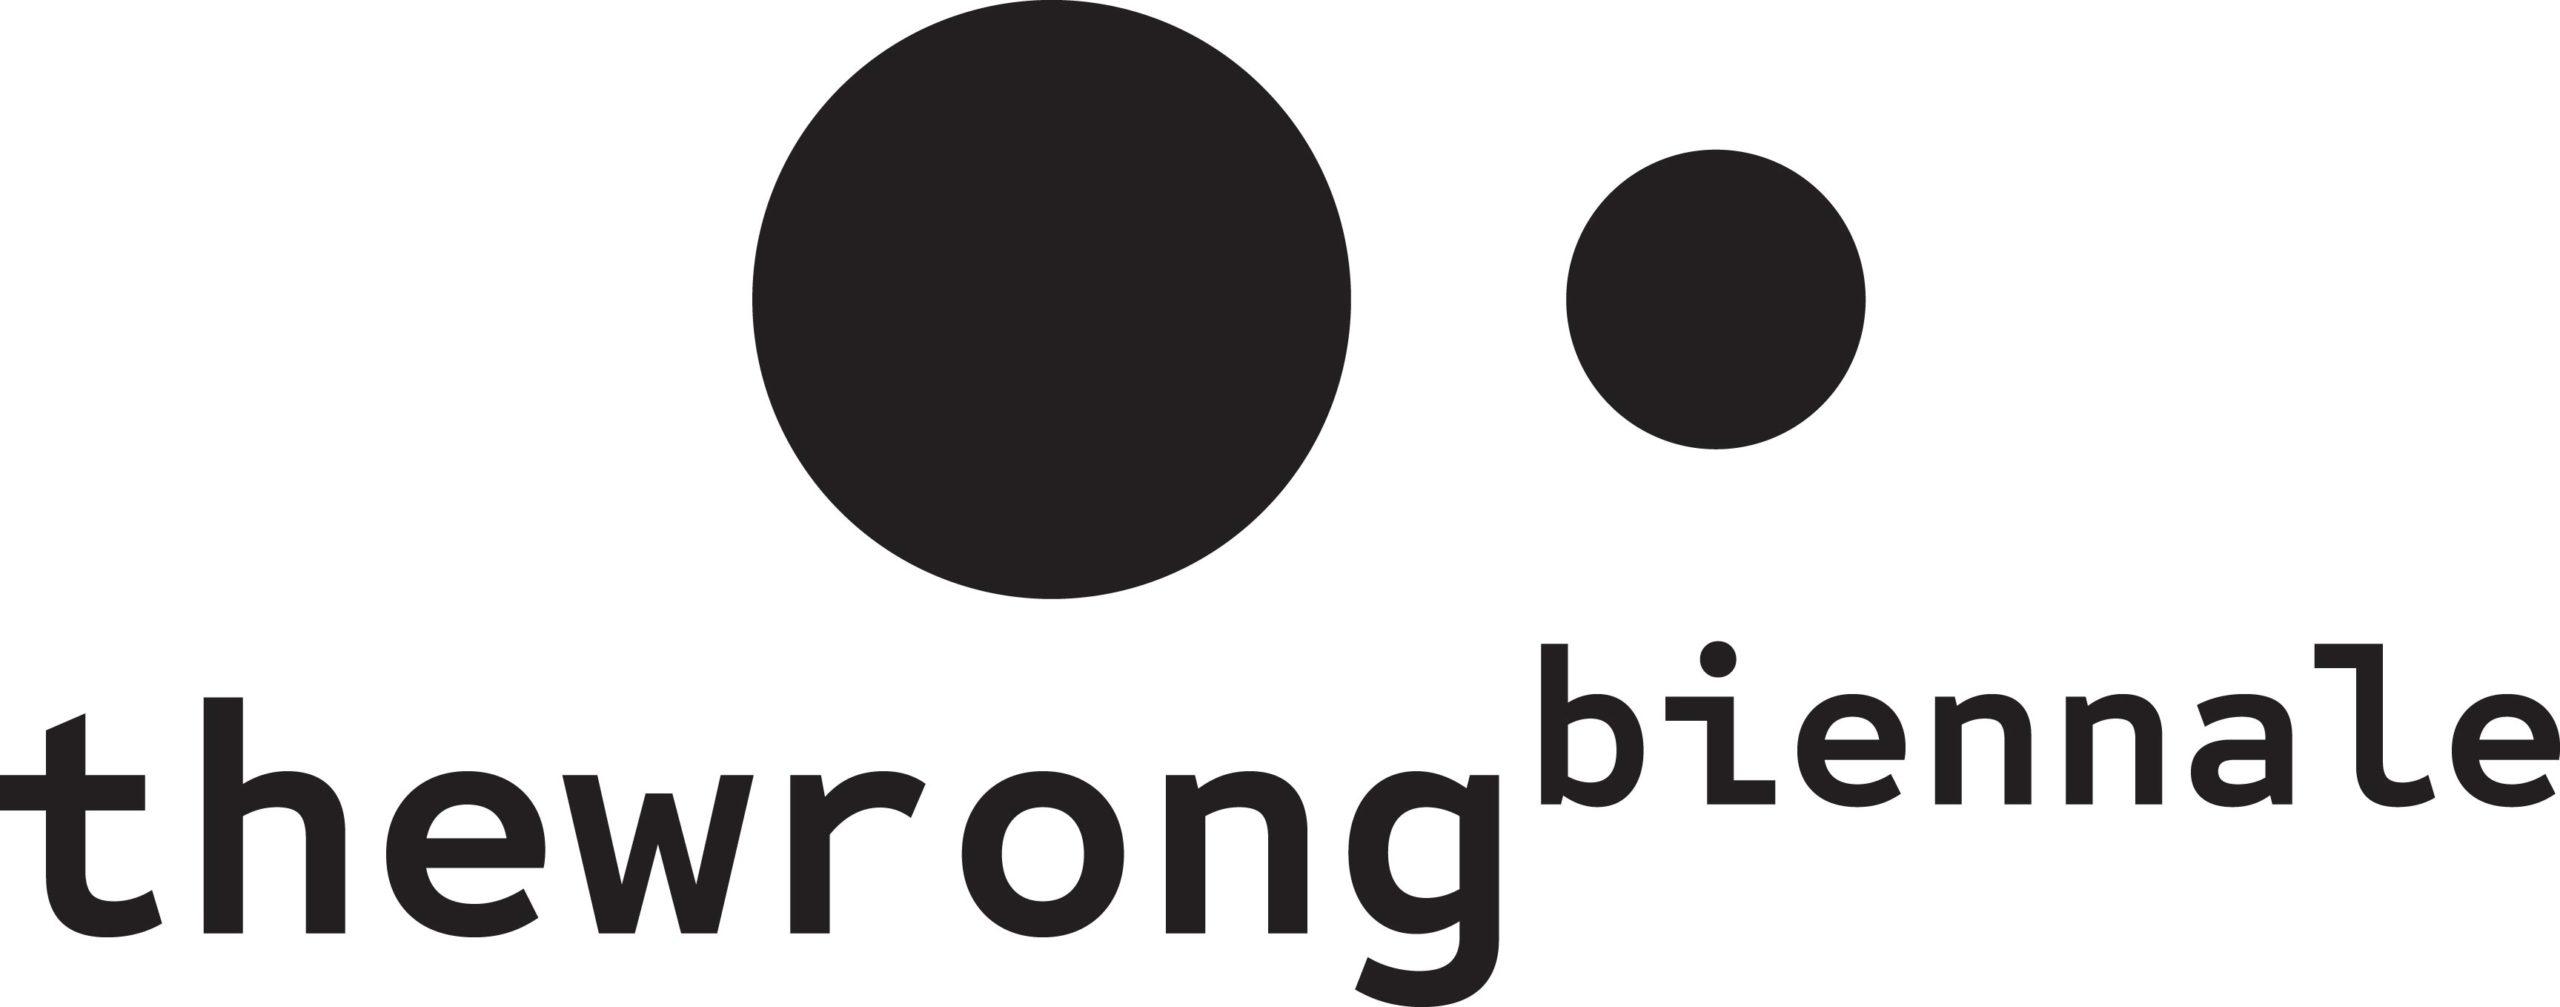 the wrong biennale logo